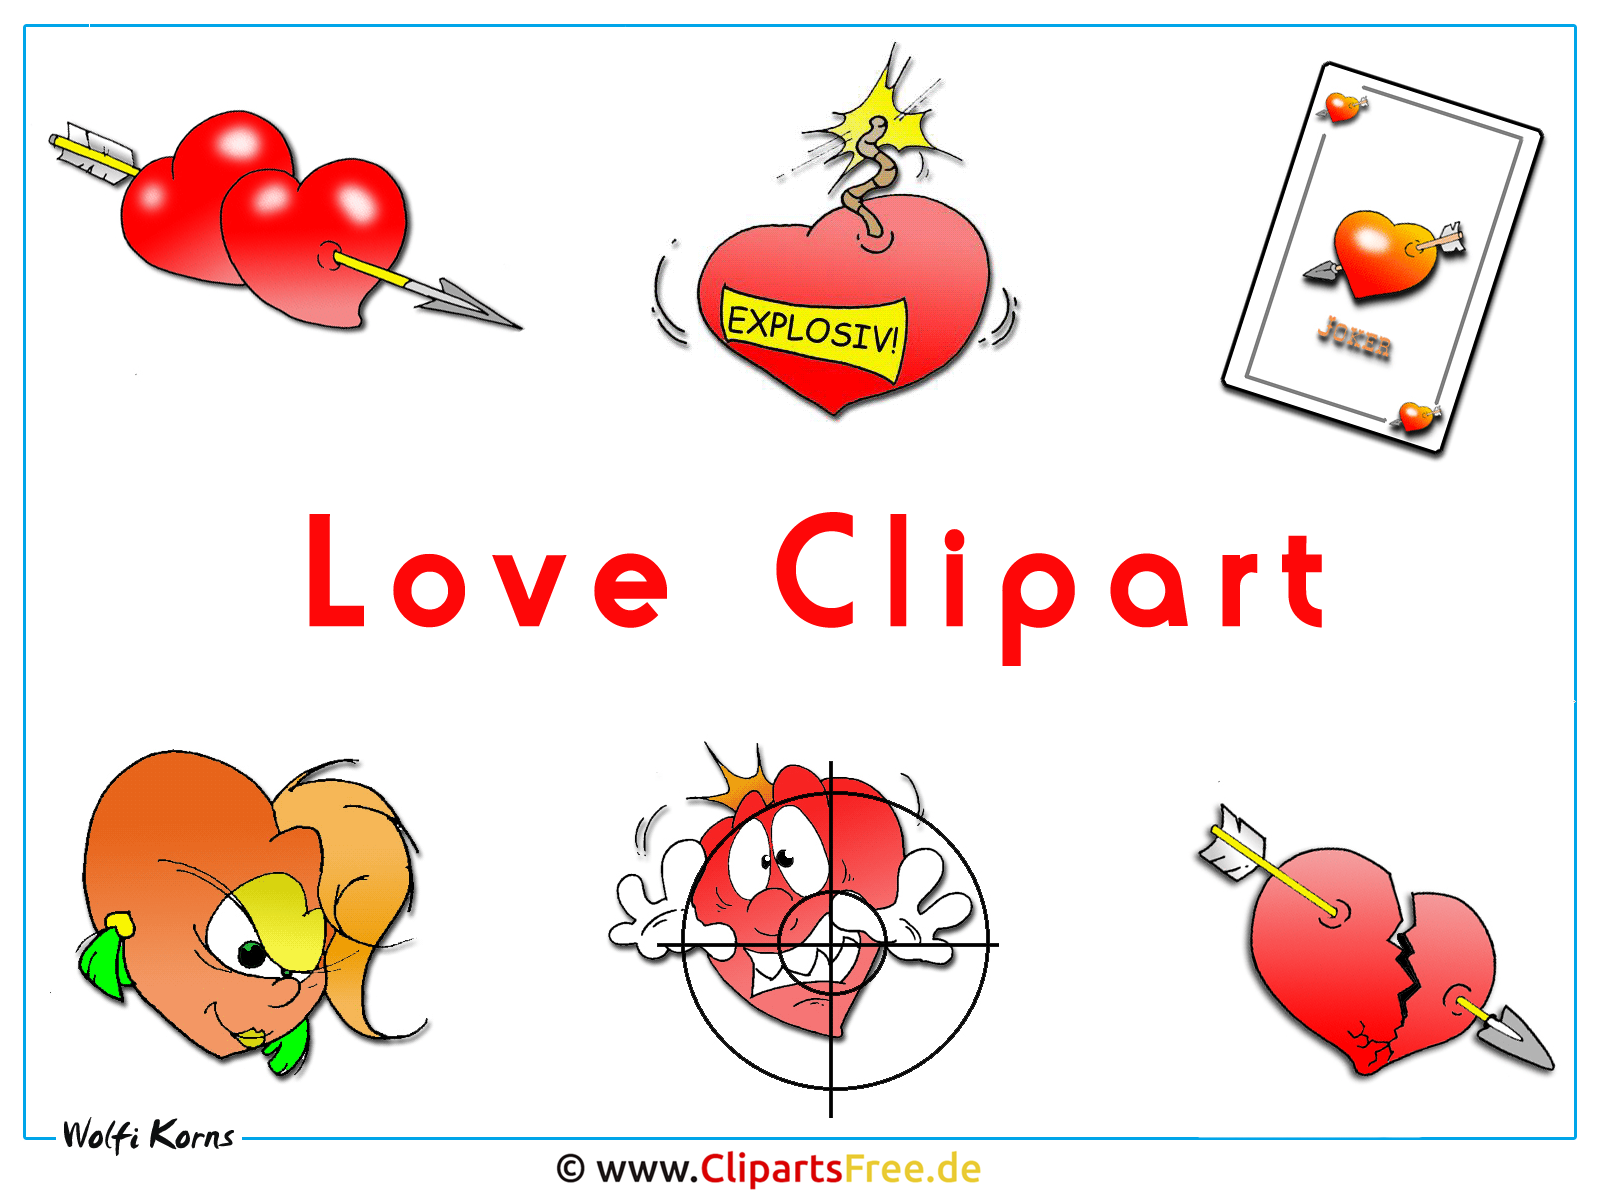 clipart free download kostenlos - photo #10